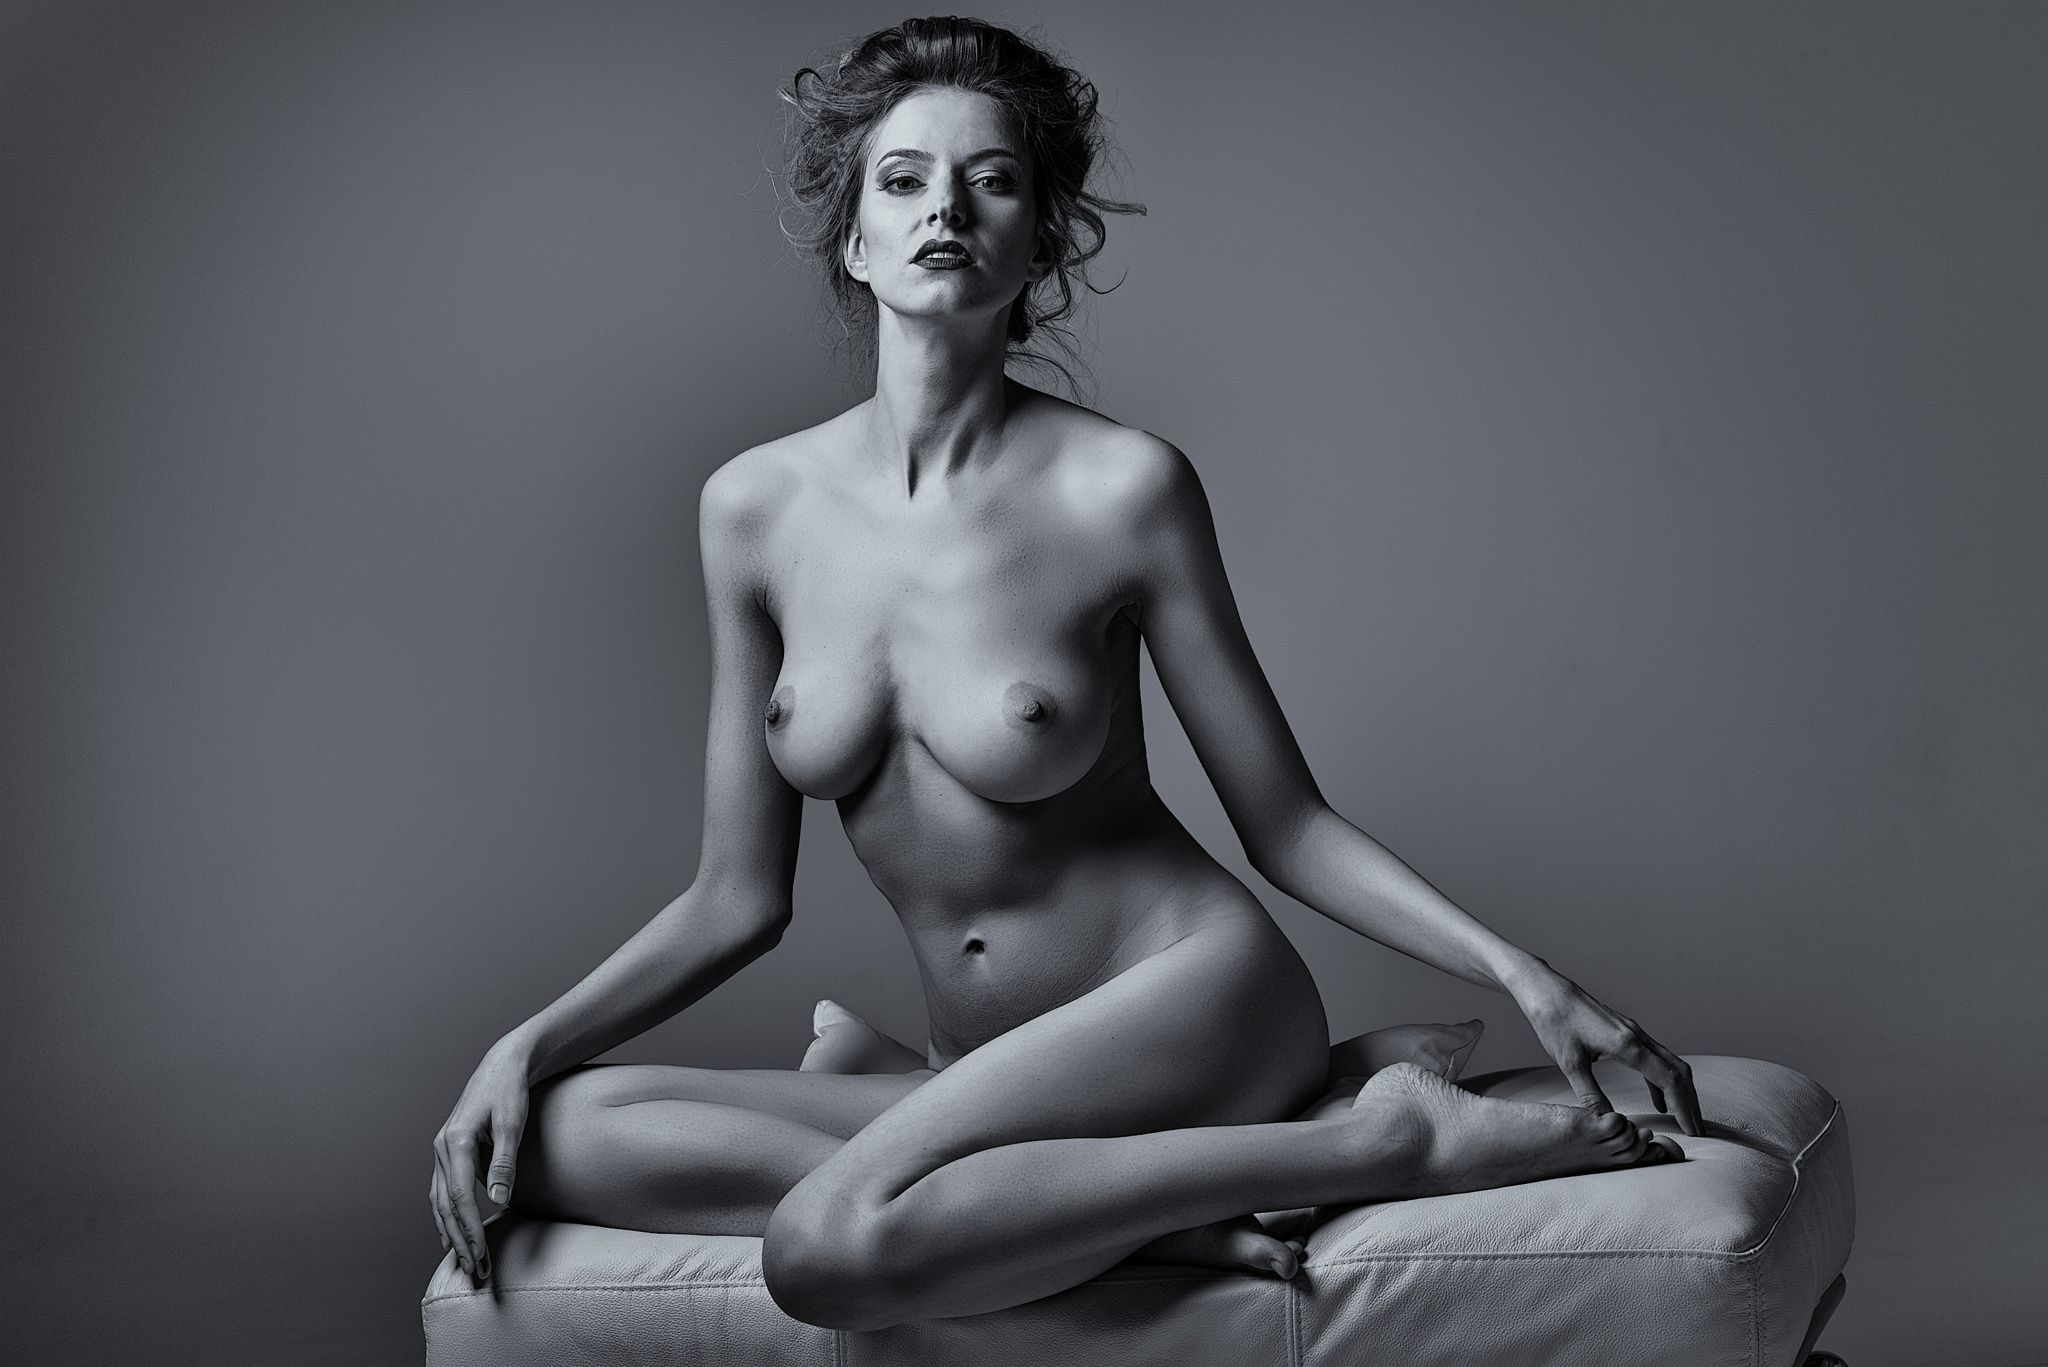 Irina shayk poses completely nude for vogue czechoslovakia